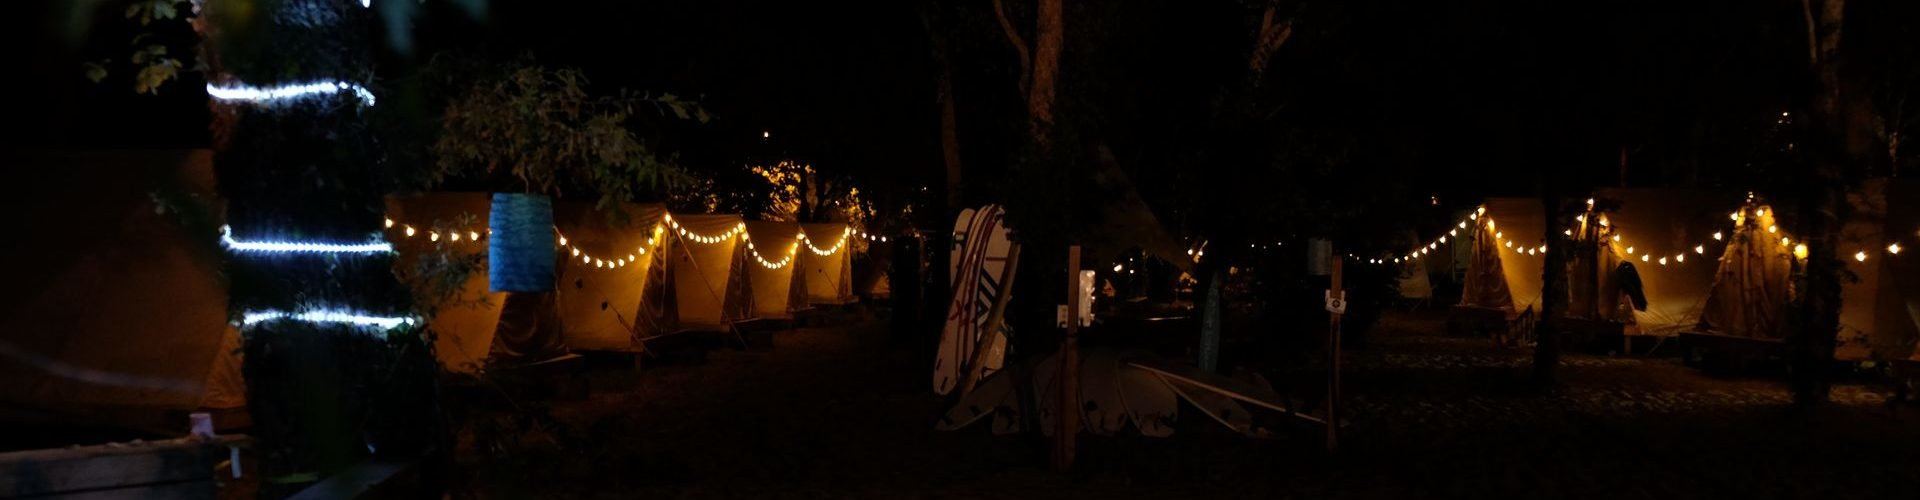 Moliets Komfortable glamping Zelte bei Nacht